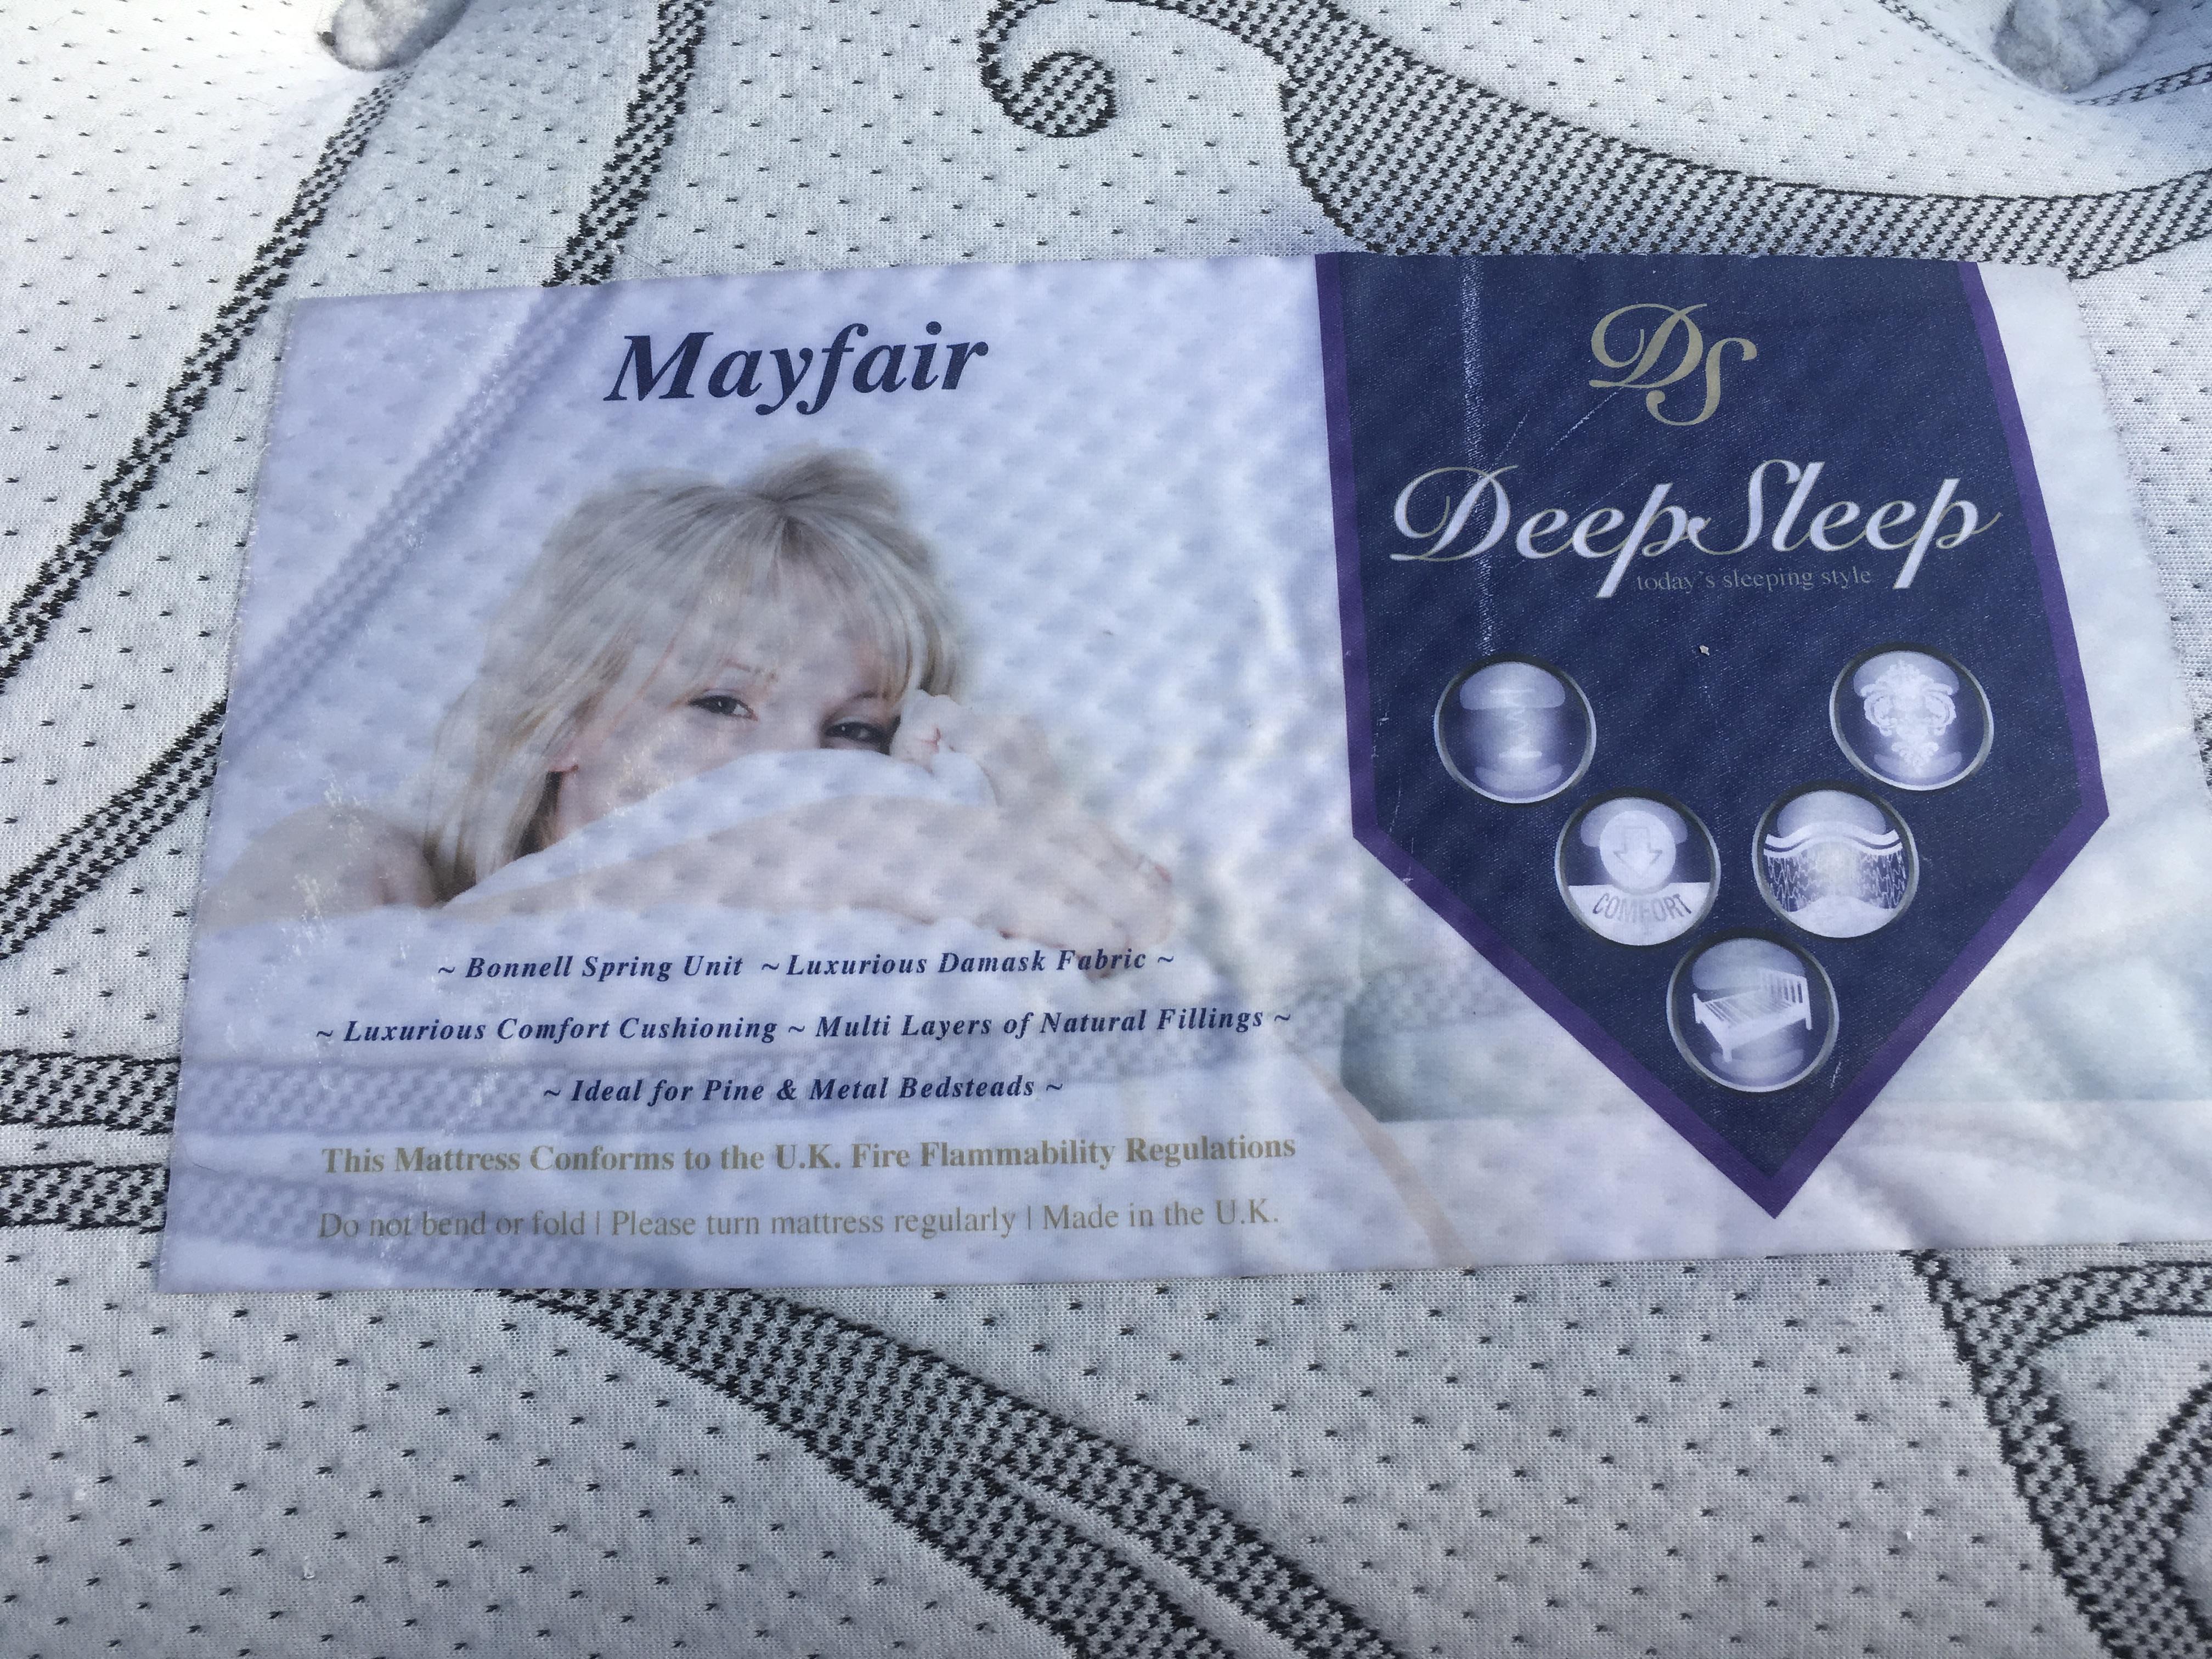 Mayfair escort party 110